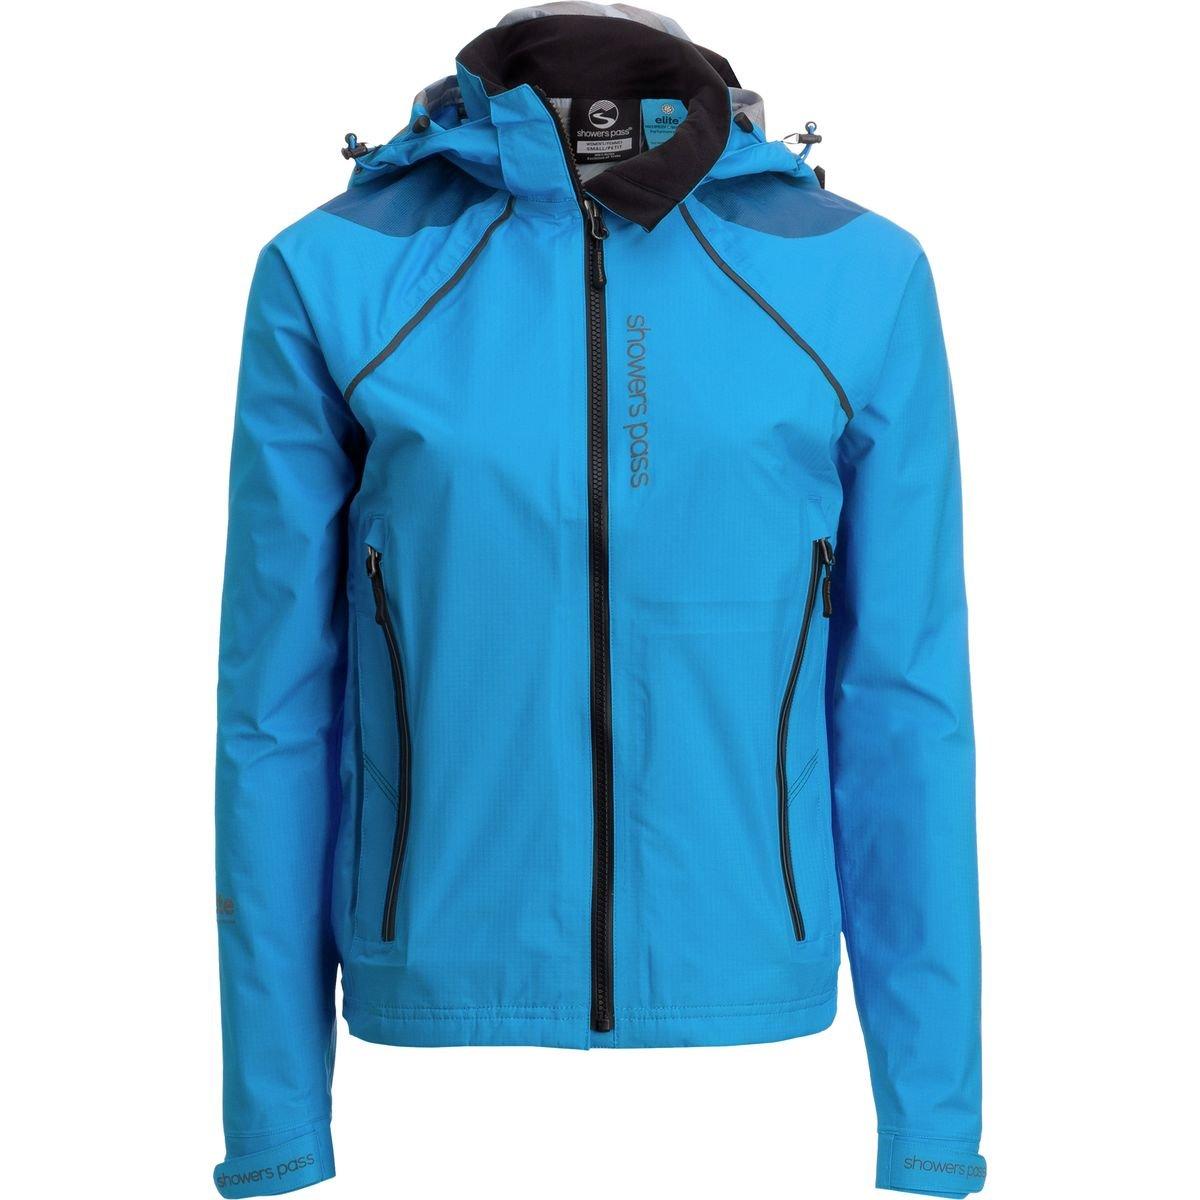 Showers Pass Refuge Jacket – Women 's B0767JJJ91 Large|ブルー(Pacific Blue) ブルー(Pacific Blue) Large